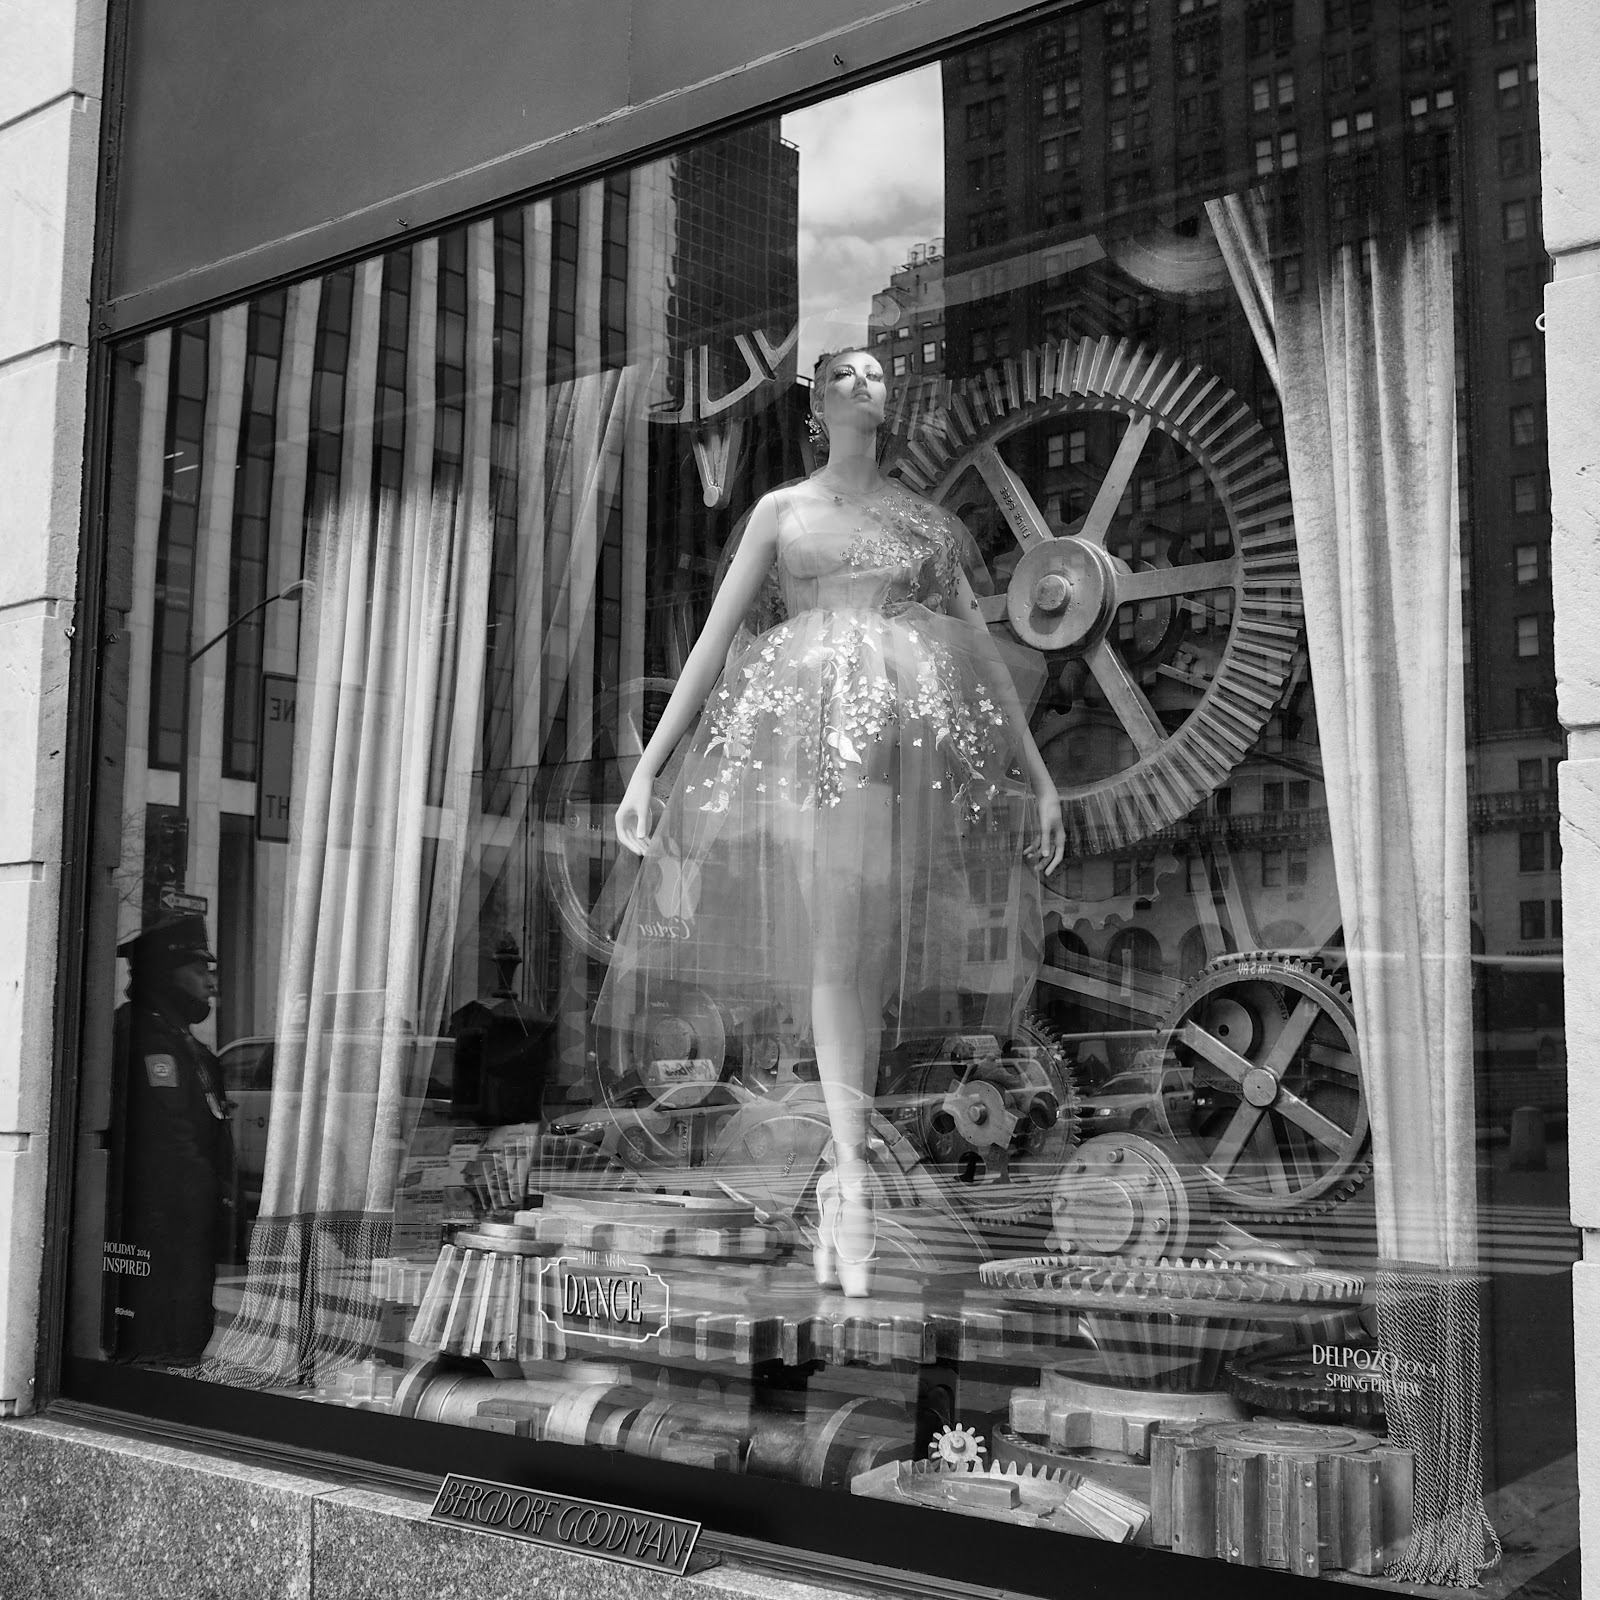 Spotlight - Black and White #Spotlightblackandwhite  #bgwindows #5thavenuewindows #holidaysinNYC #besttimeoftheyear ©2014 Nancy Lundebjerg